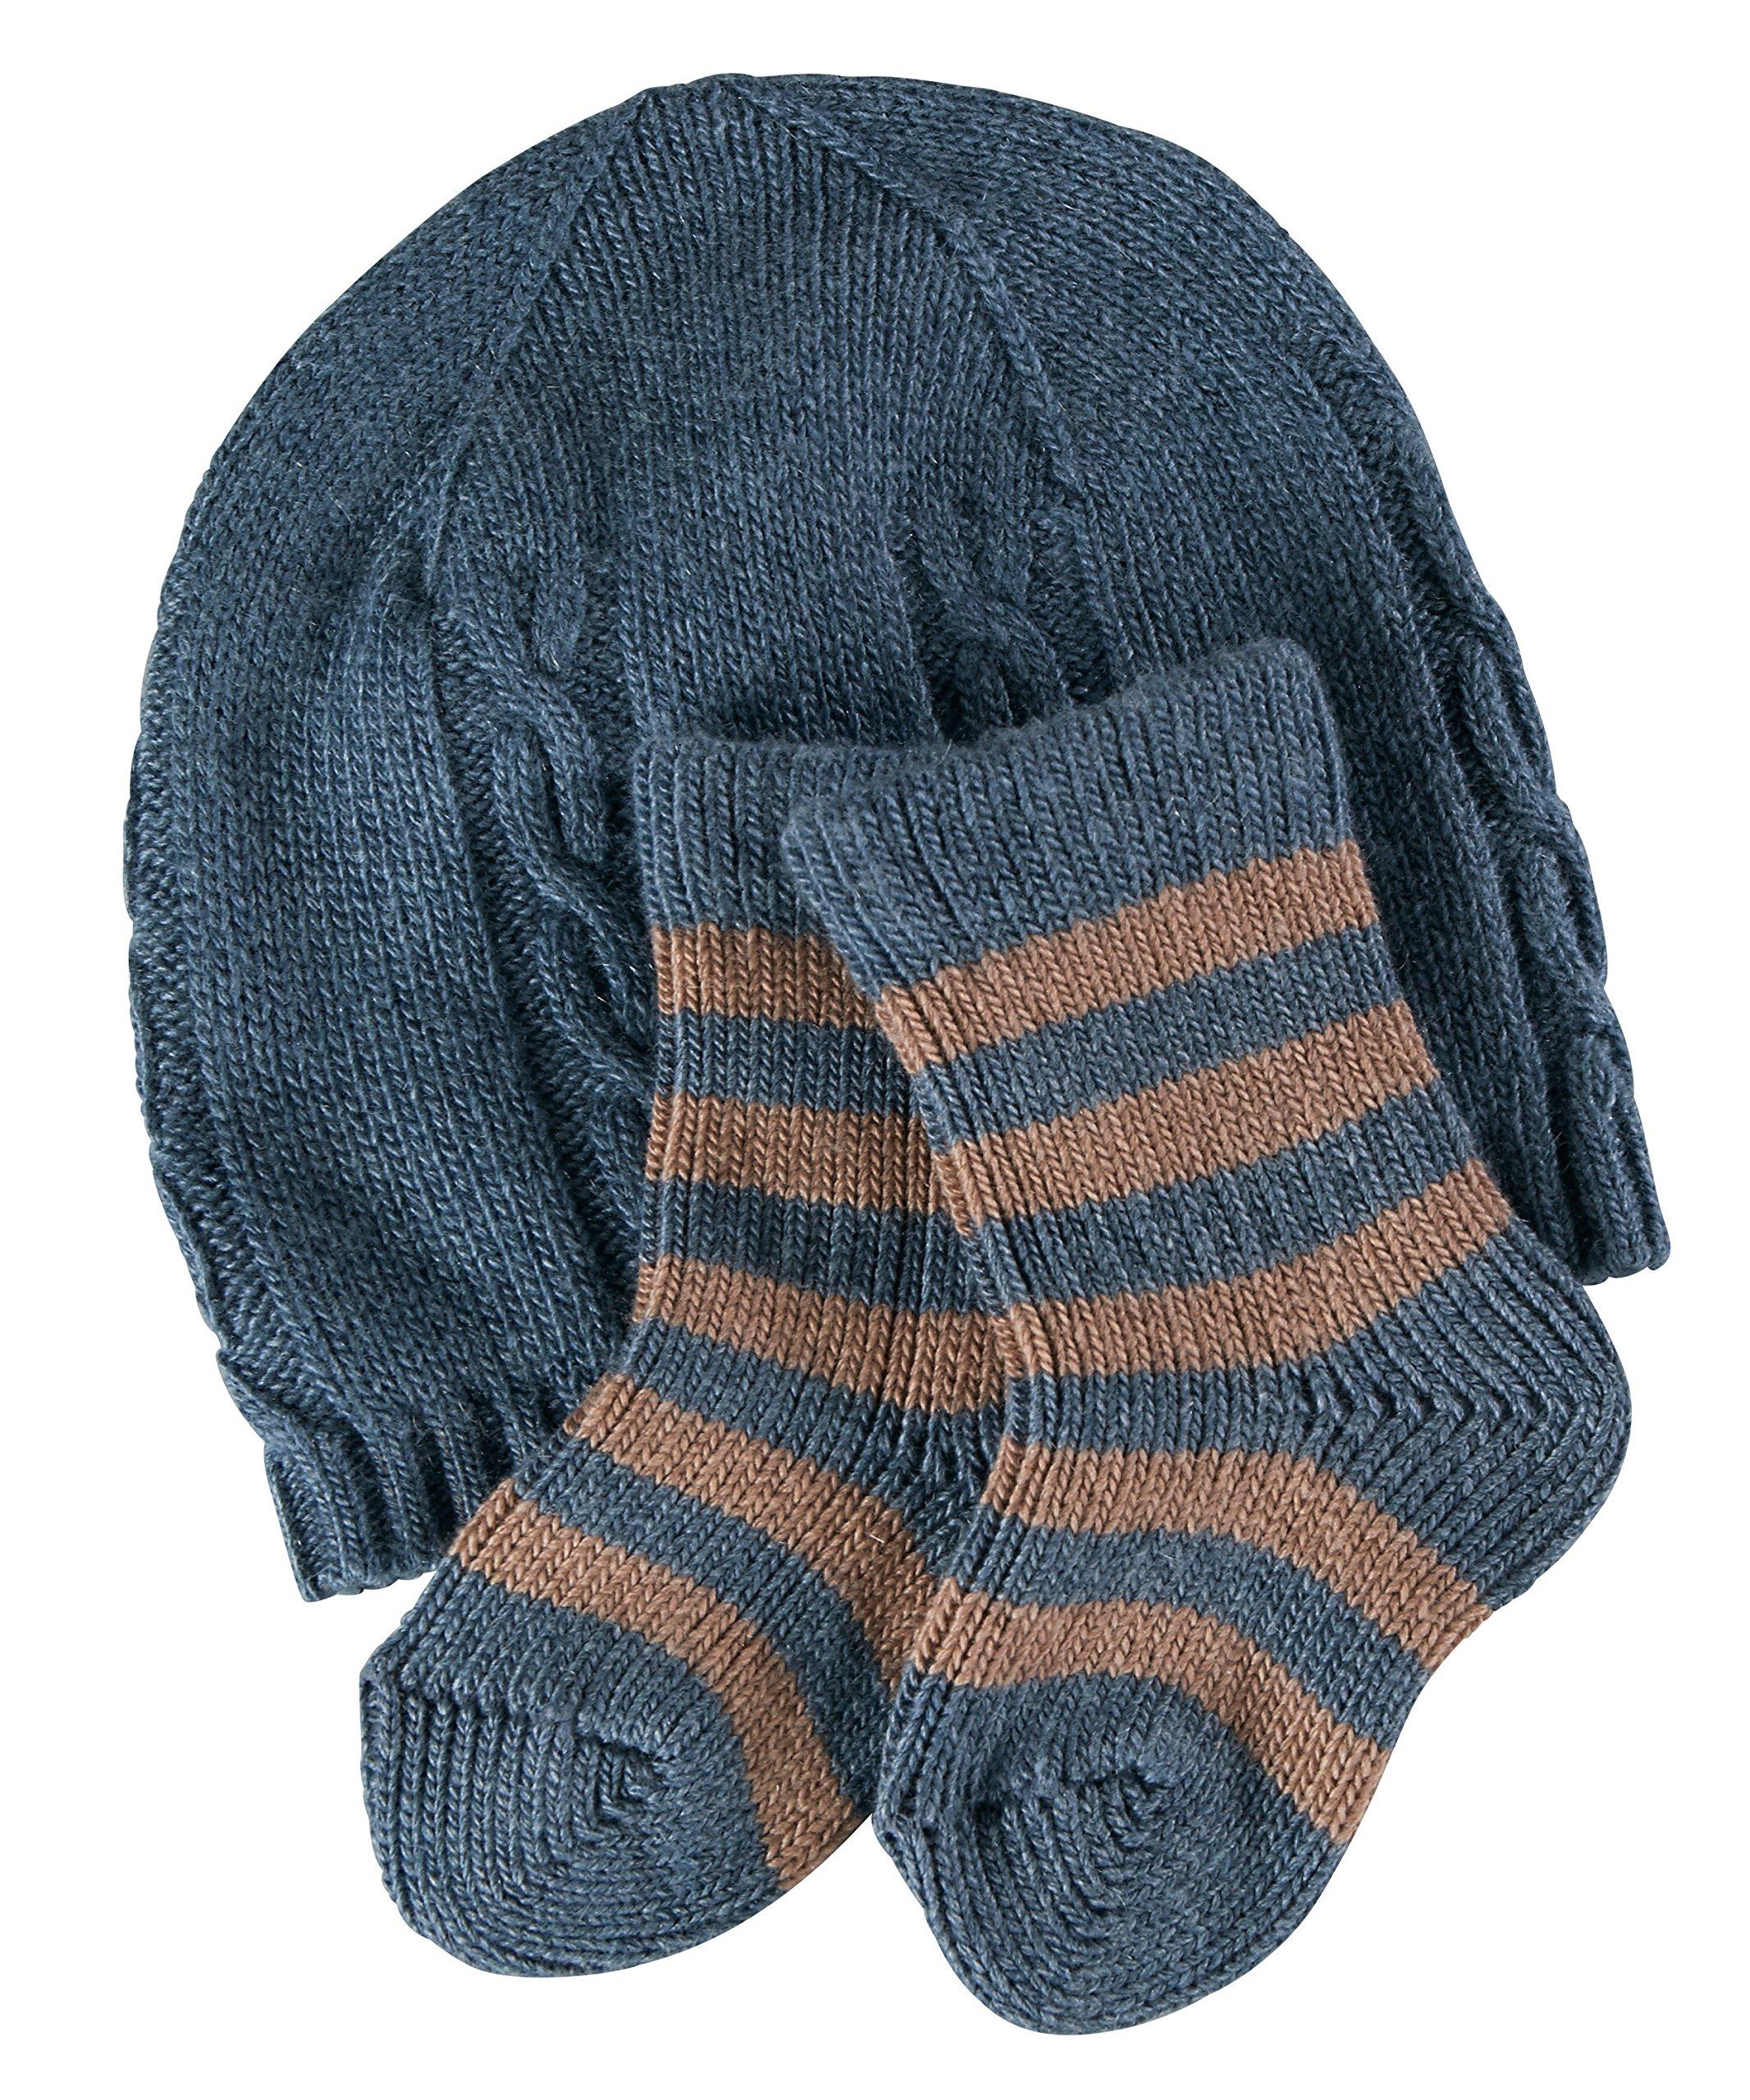 Falke Baby Boy's Cashmere Blend Gift Set (Infant) Thistle 62-68 (1-6 Months)